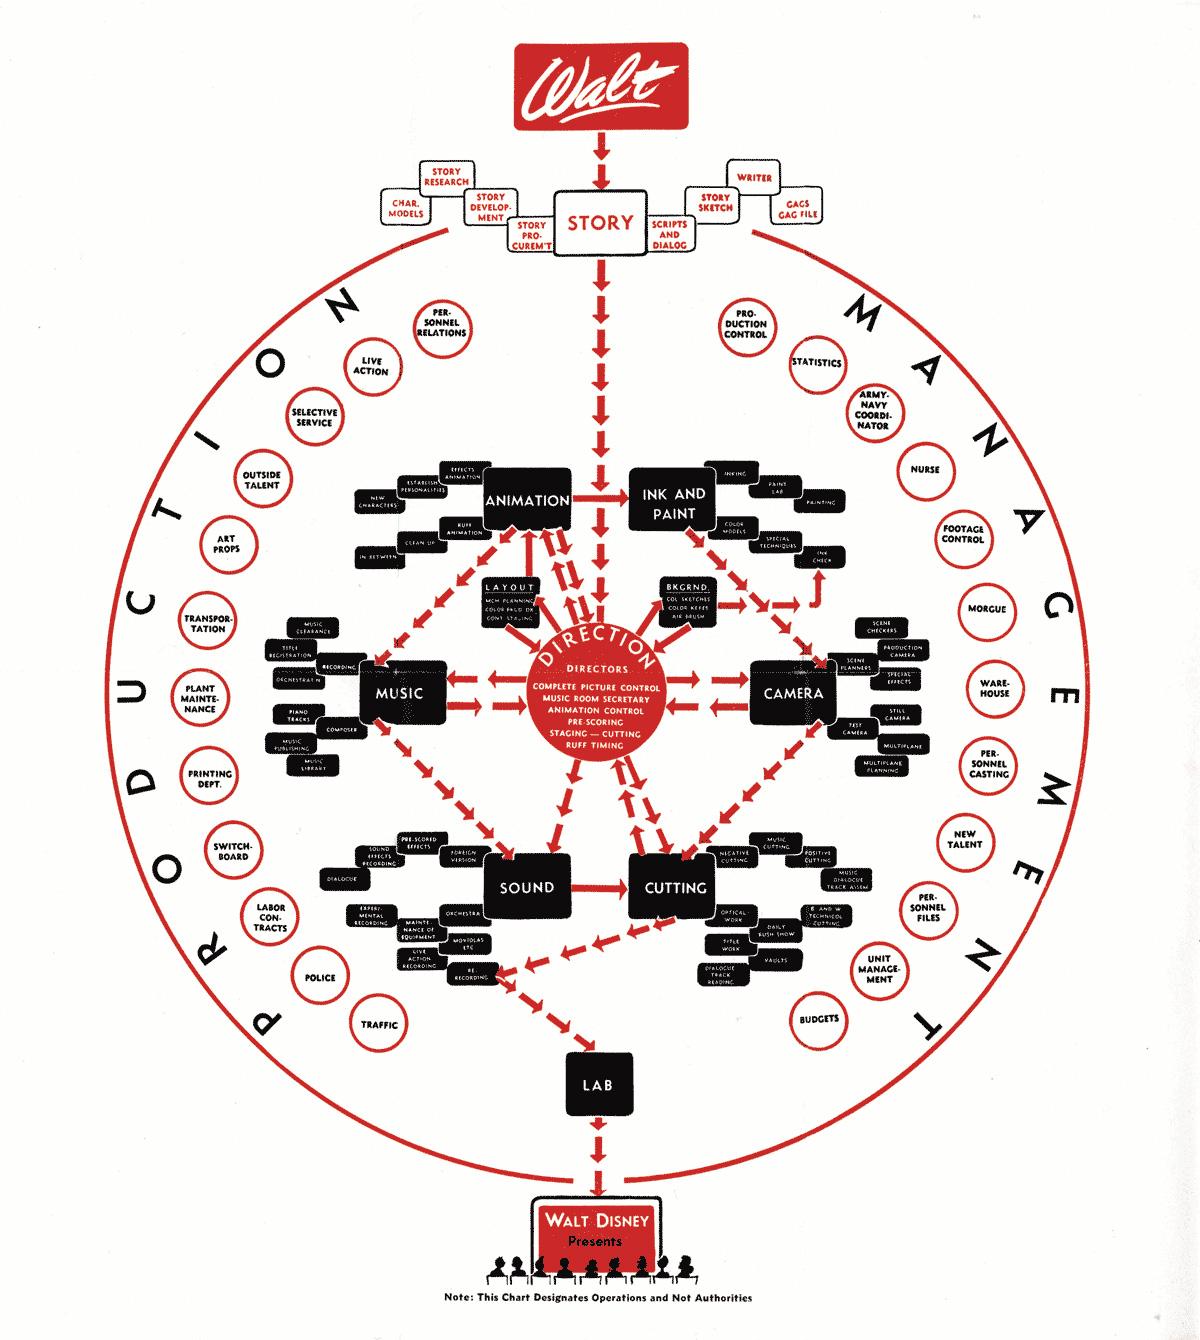 disney organisational structure